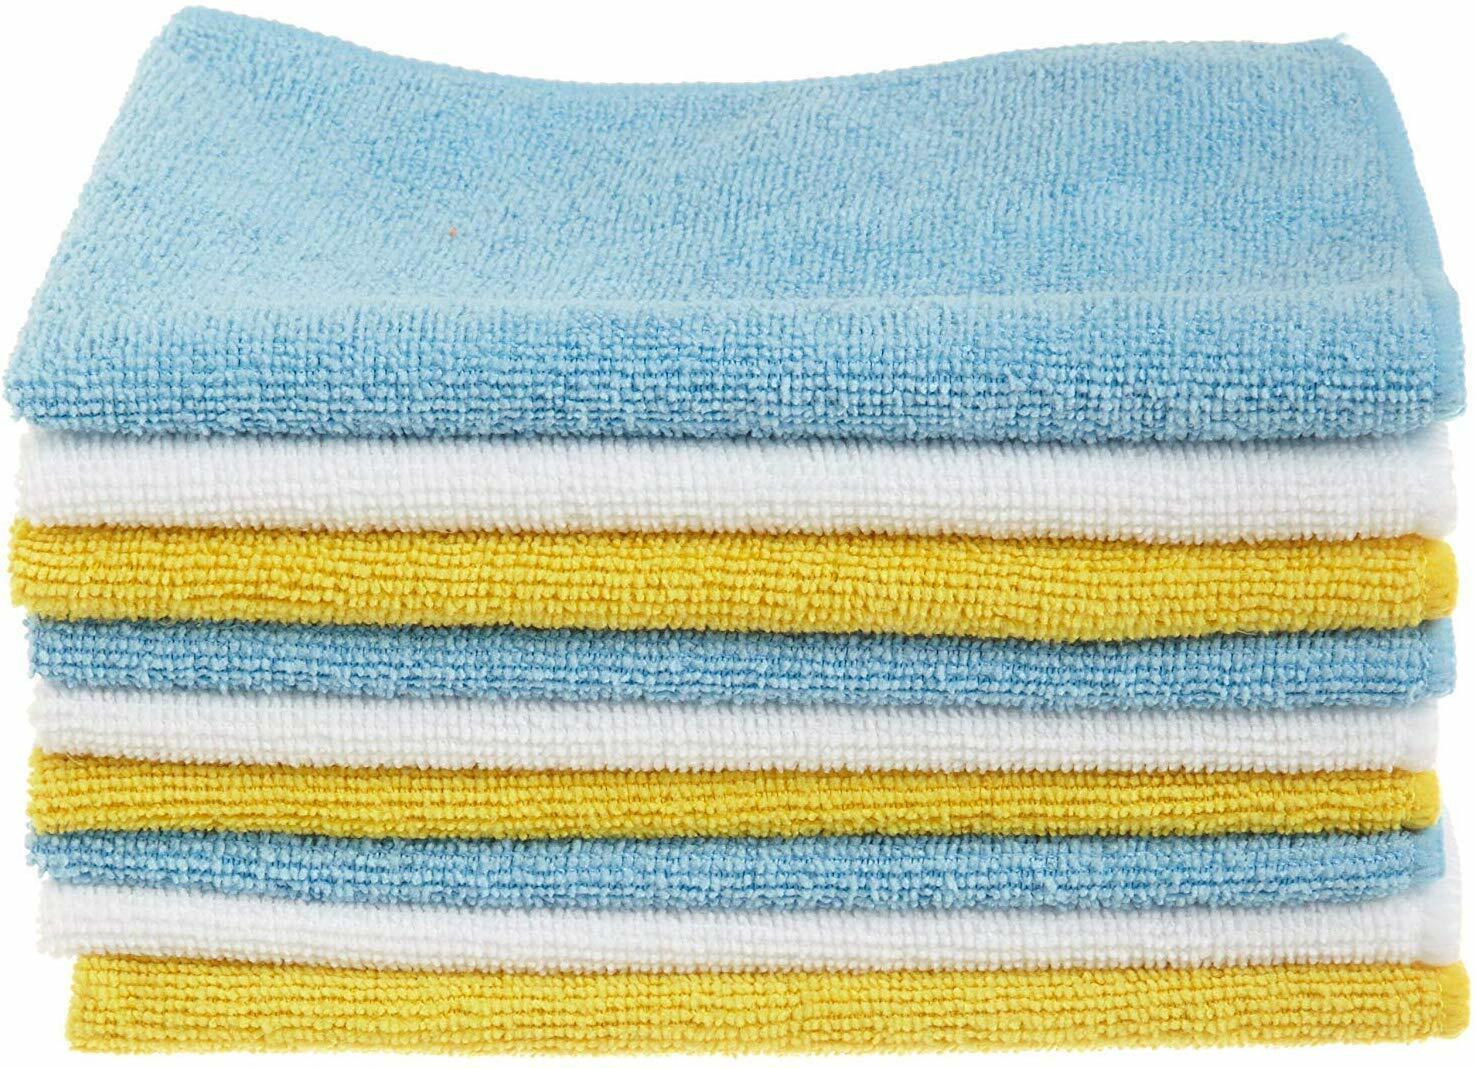 AmazonBasics Microfiber Cleaning Cloth - 24-Pack